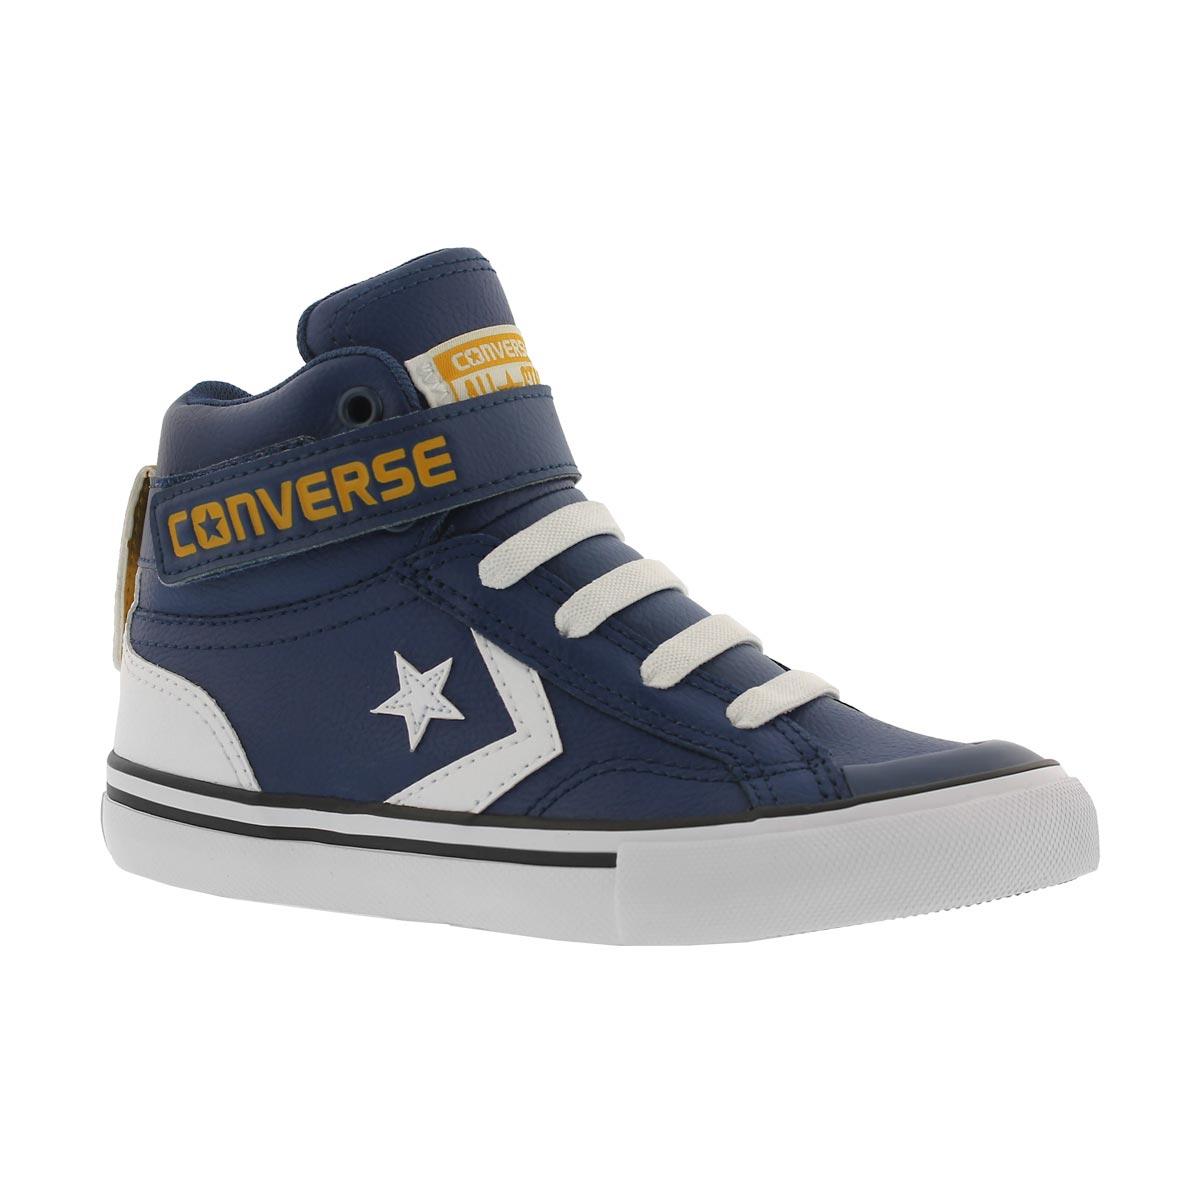 Boys' PRO BLAZE HI navy/white/yellow sneakers